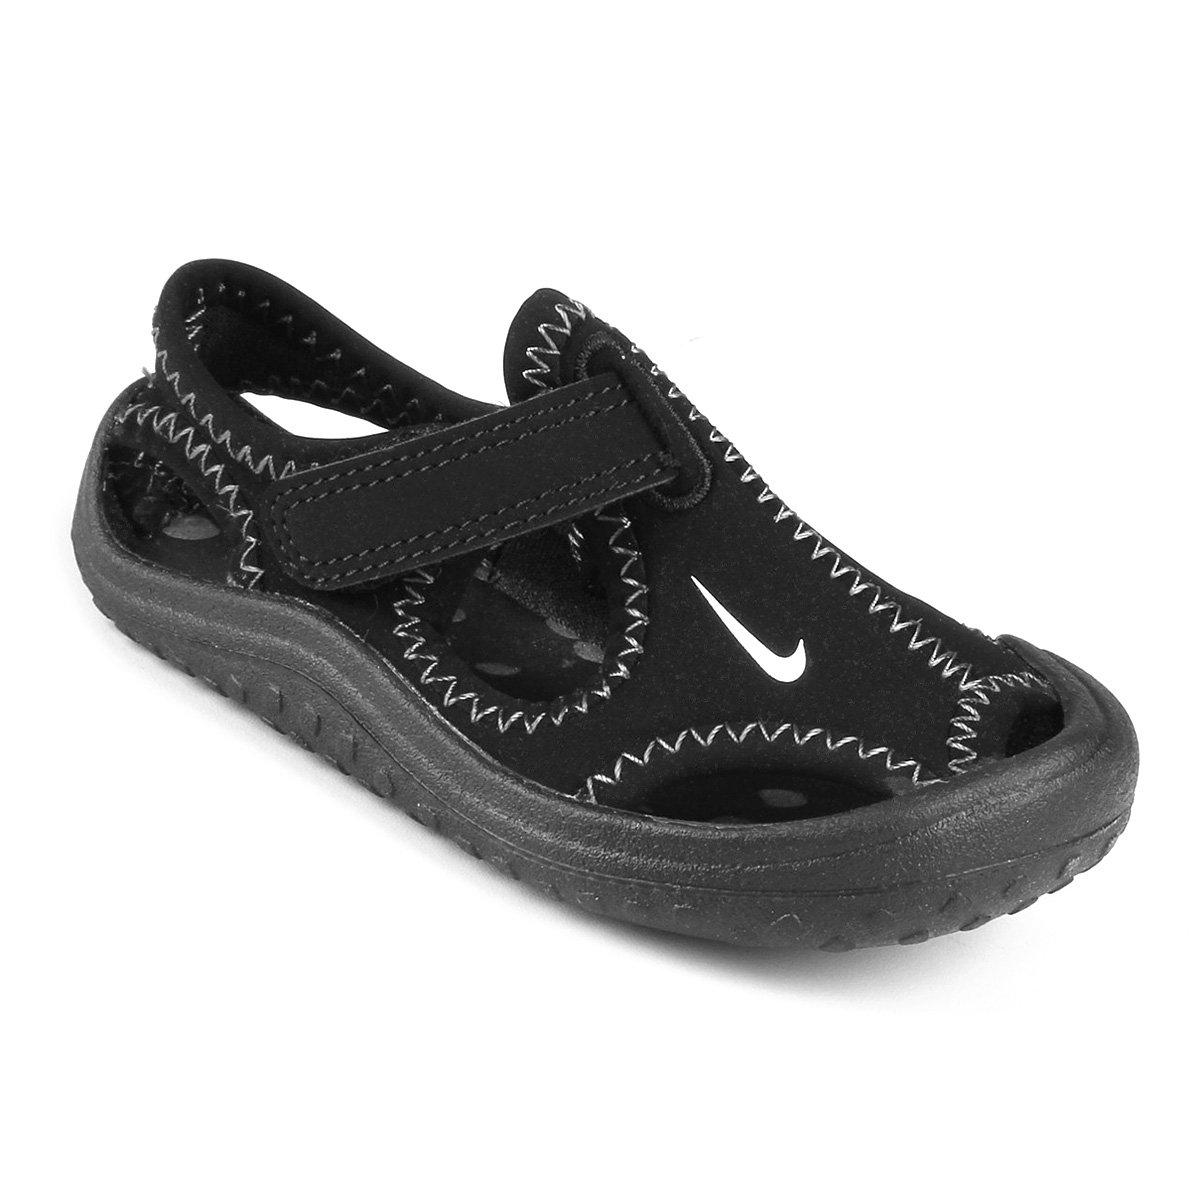 c4cd96b34 Sandália Infantil Nike Sunray Protect Masculina | Netshoes